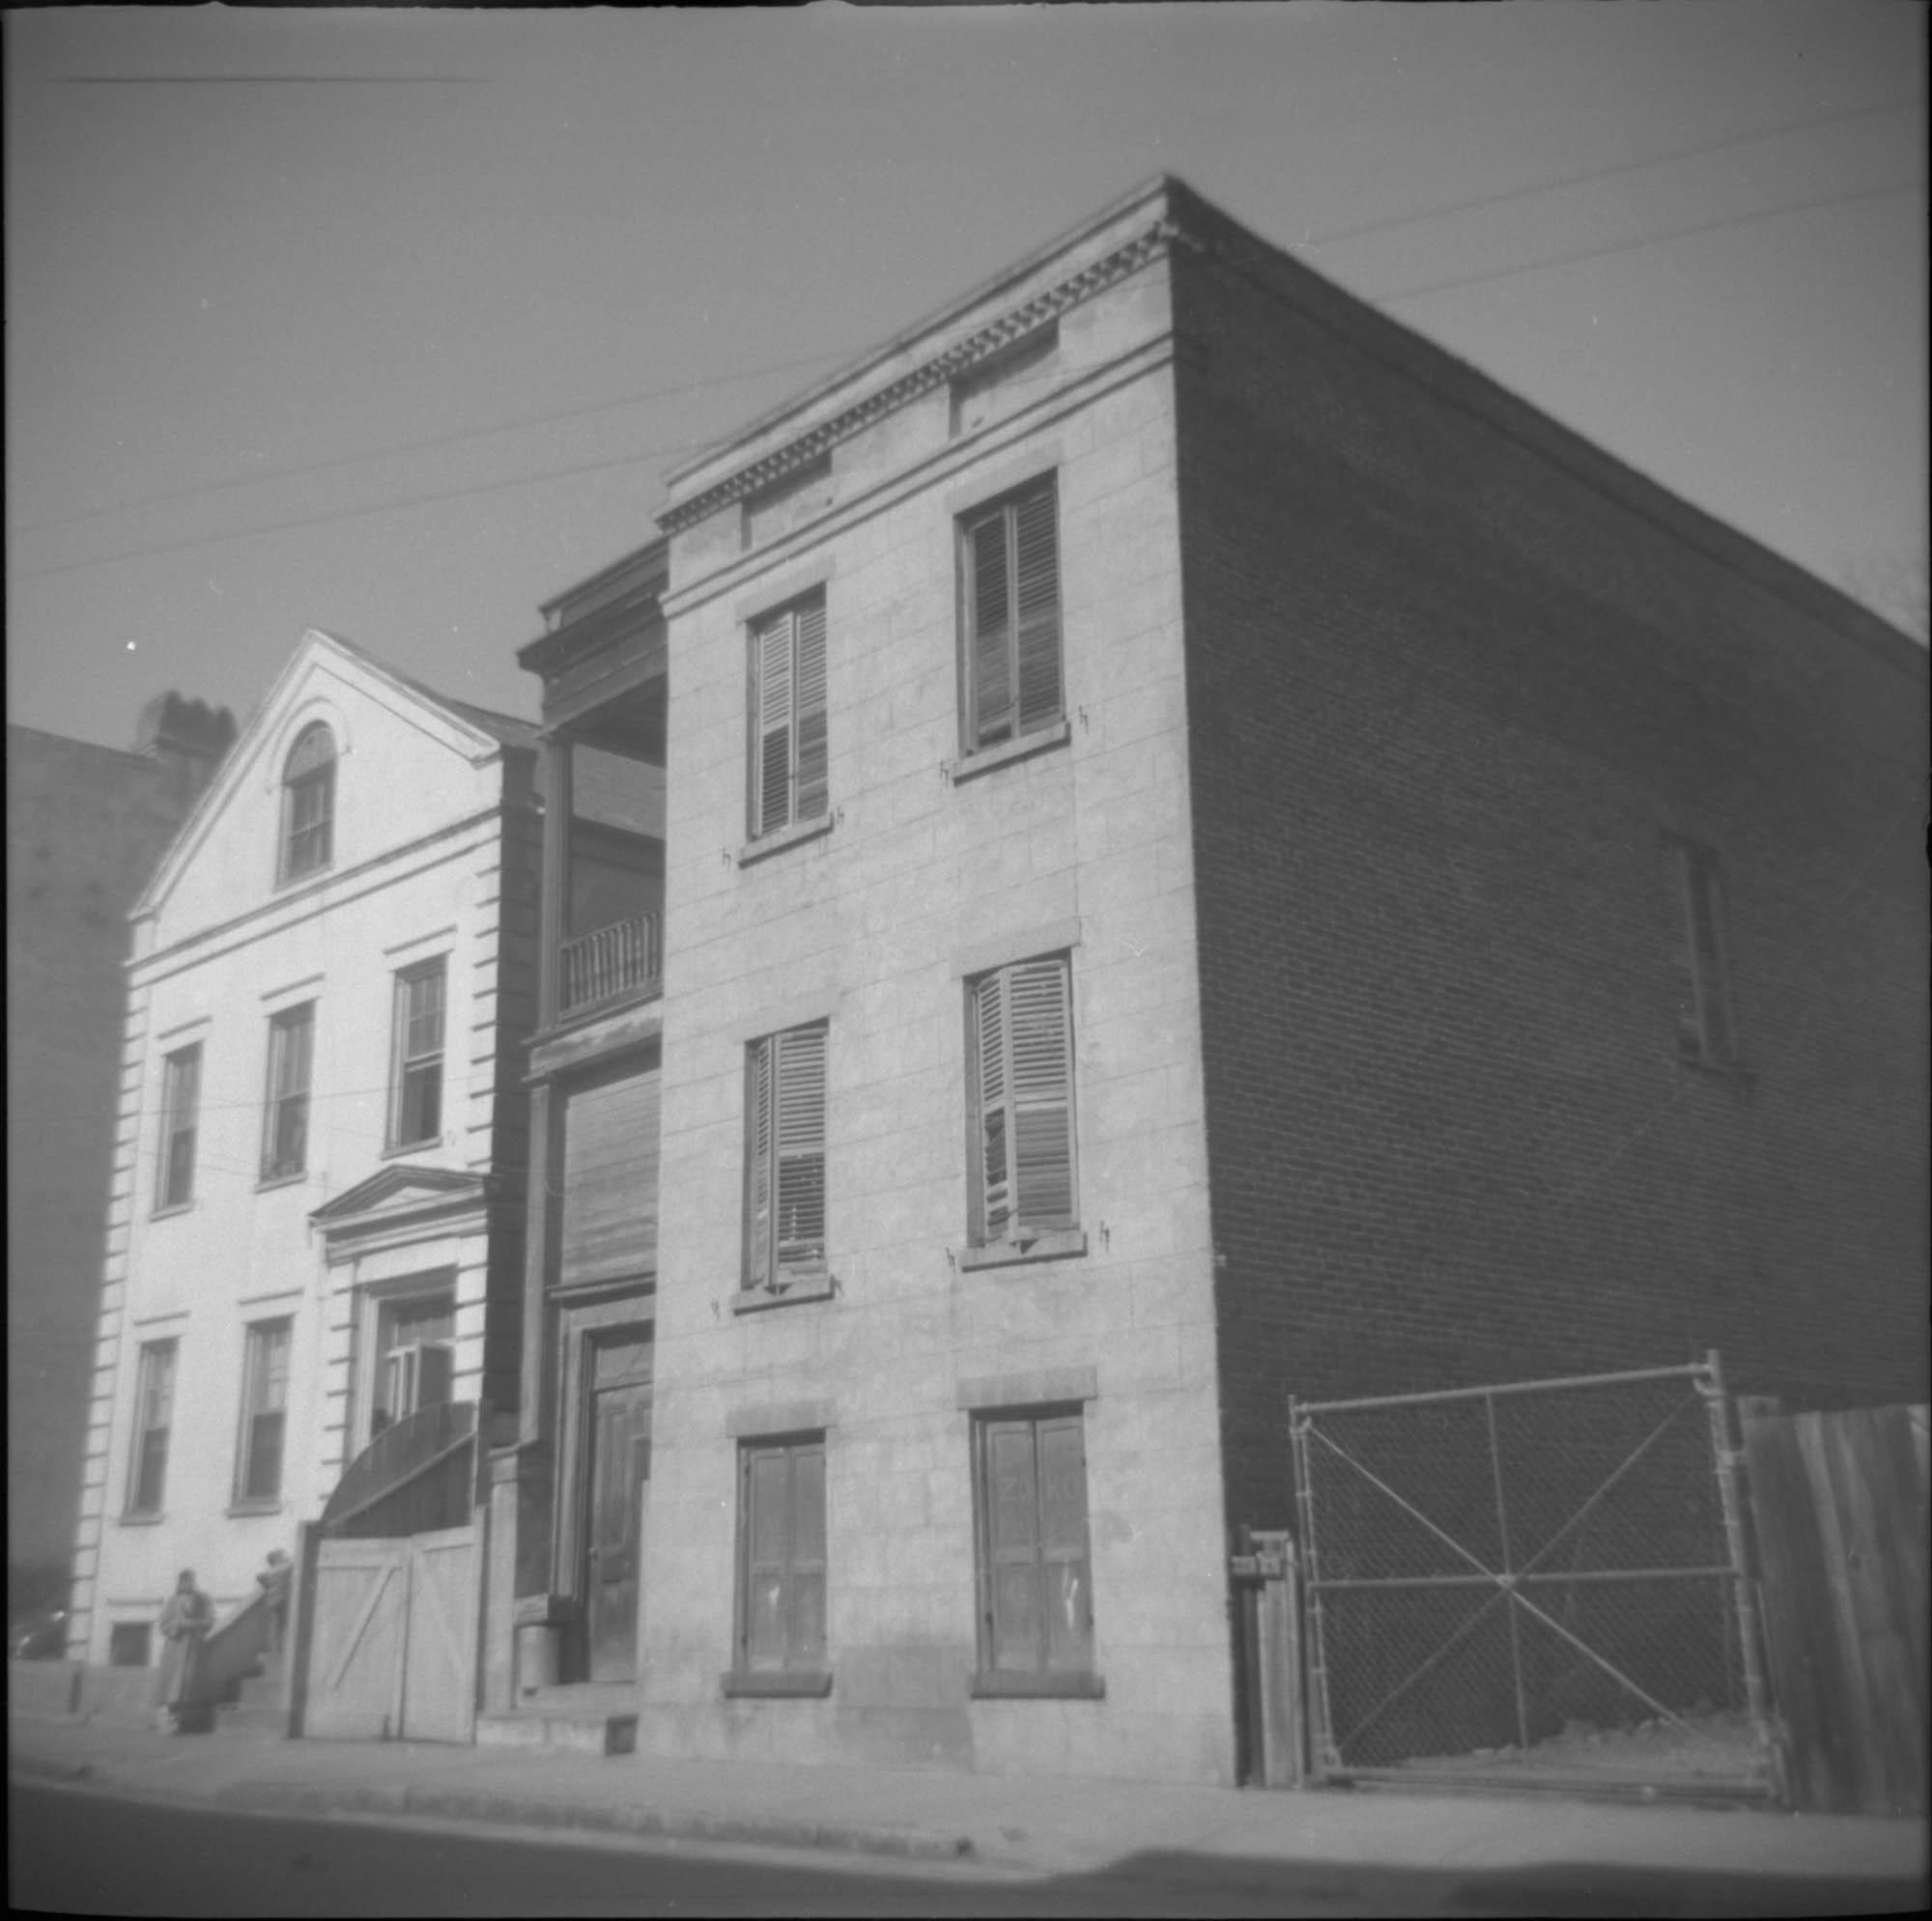 54 and 56 Society Street